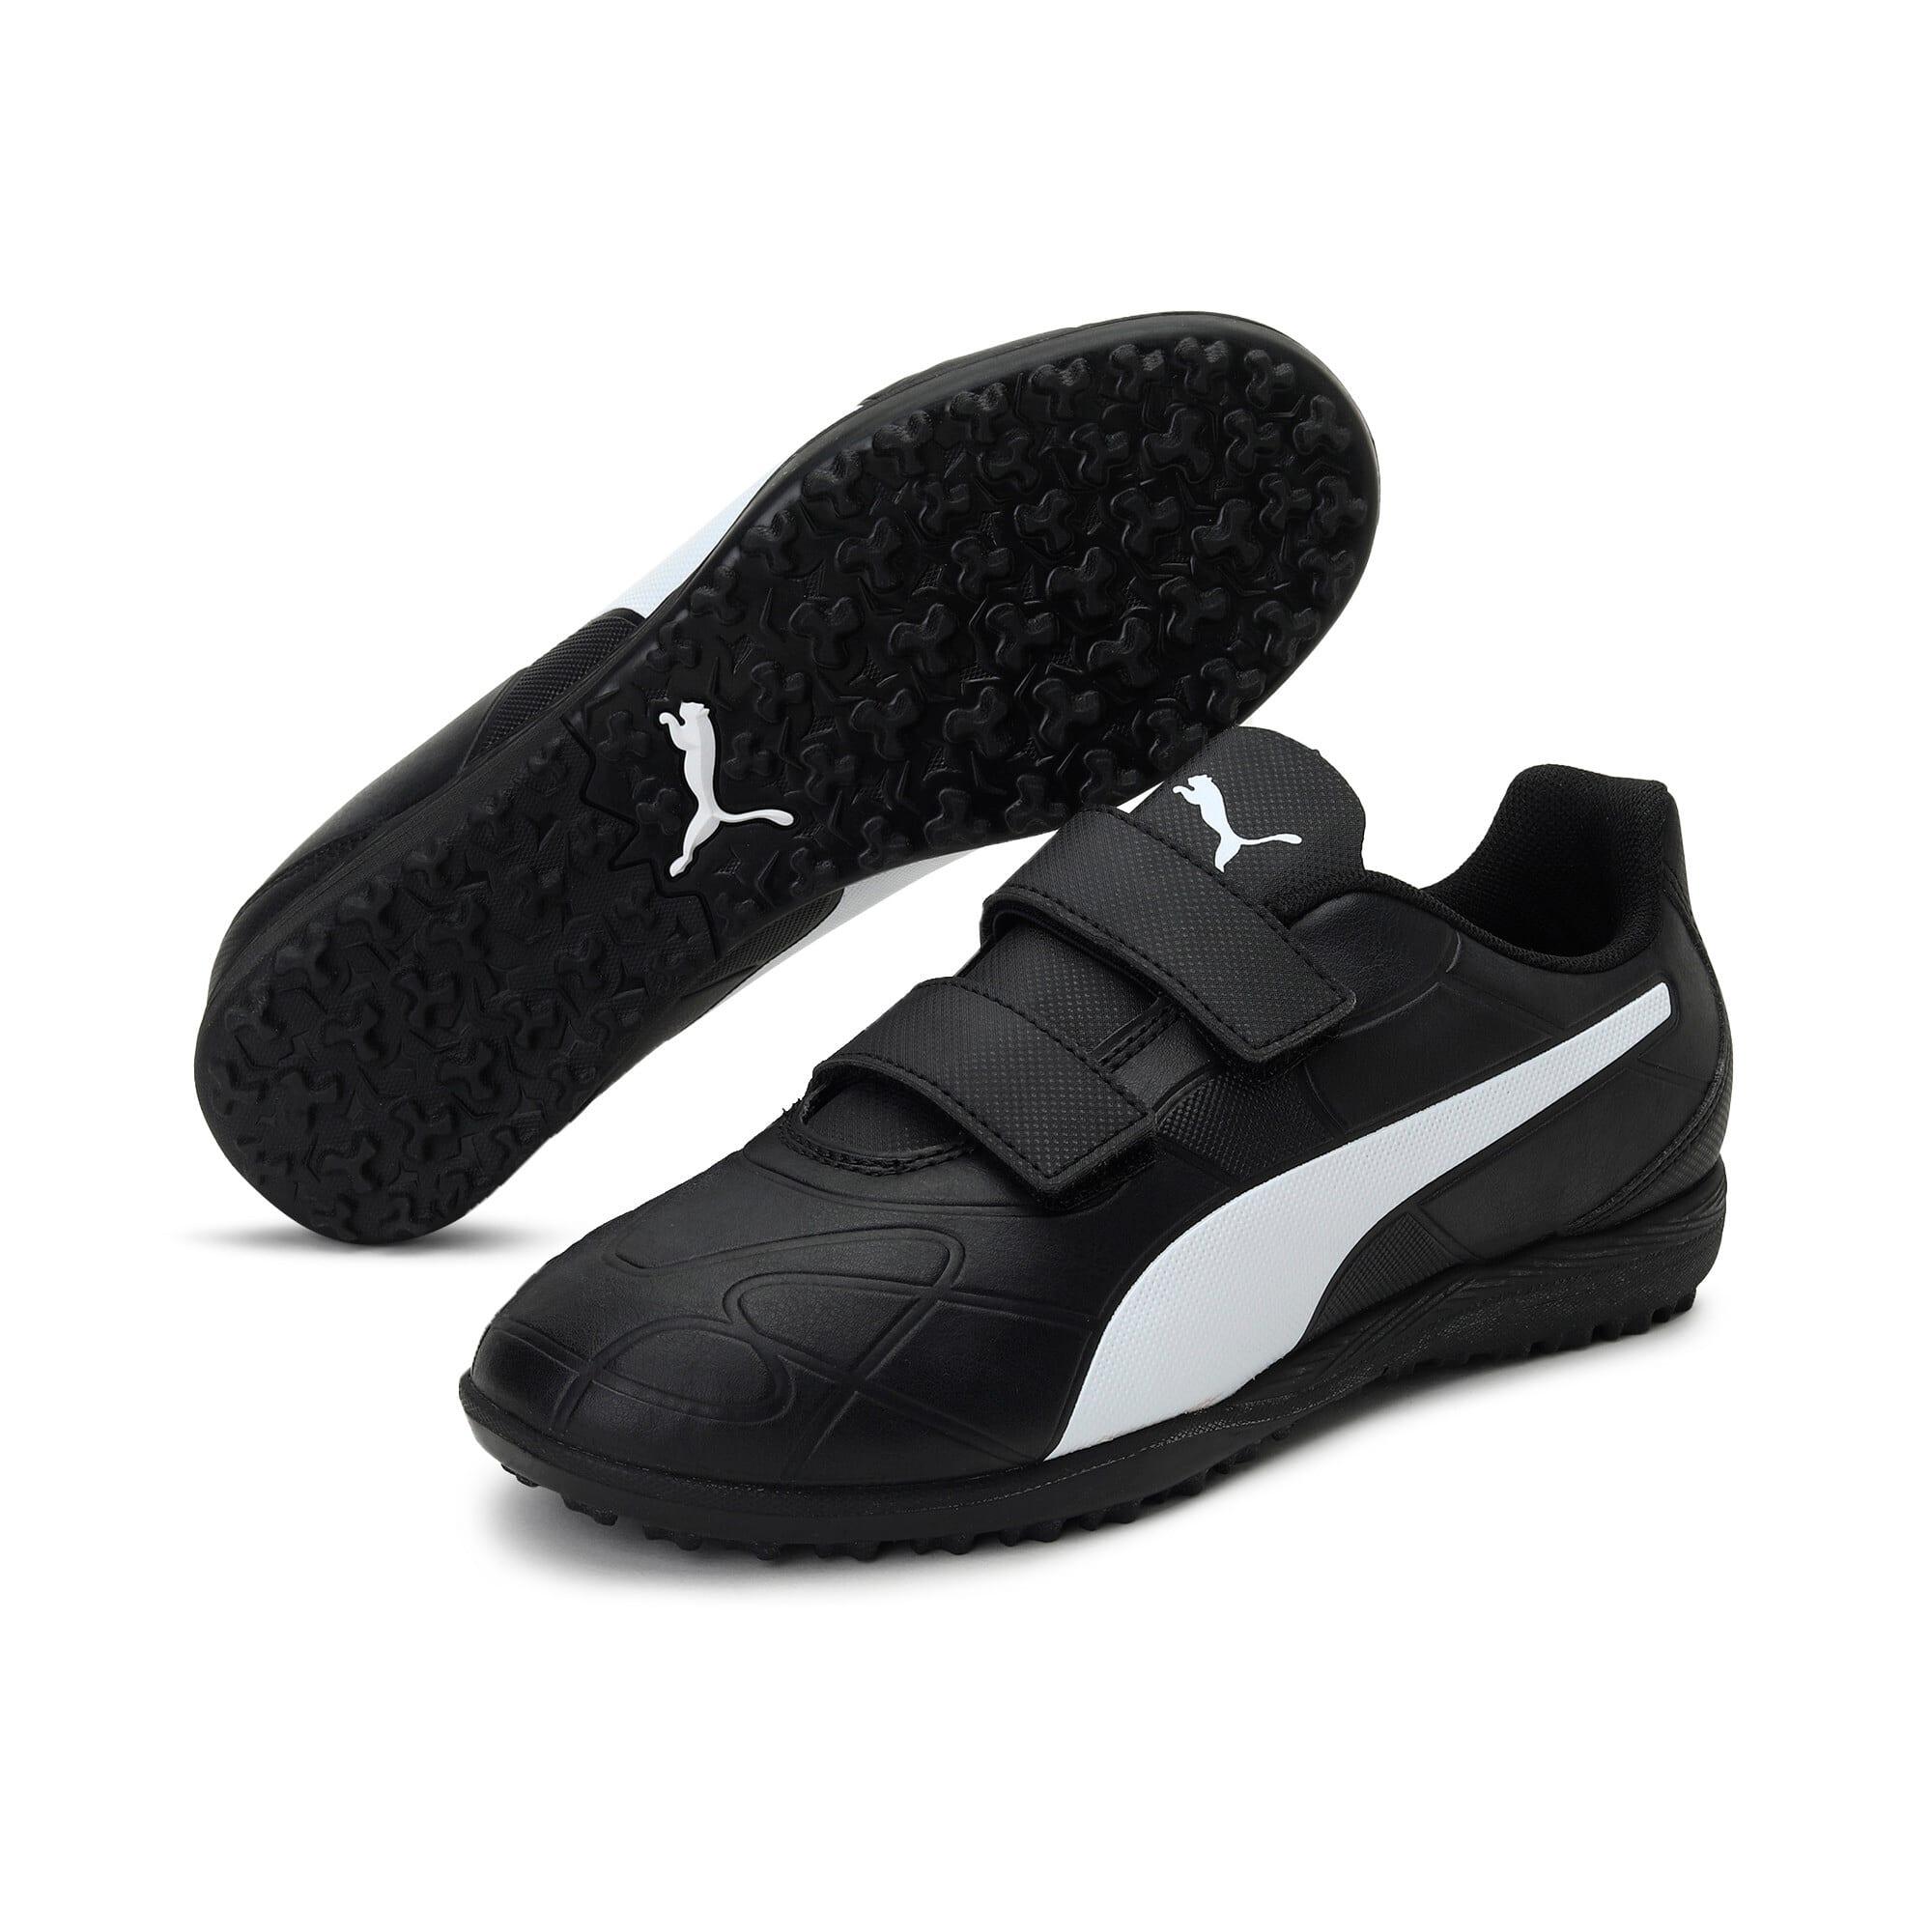 Thumbnail 2 of Monarch TT Youth Football Boots, Puma Black-Puma White, medium-IND